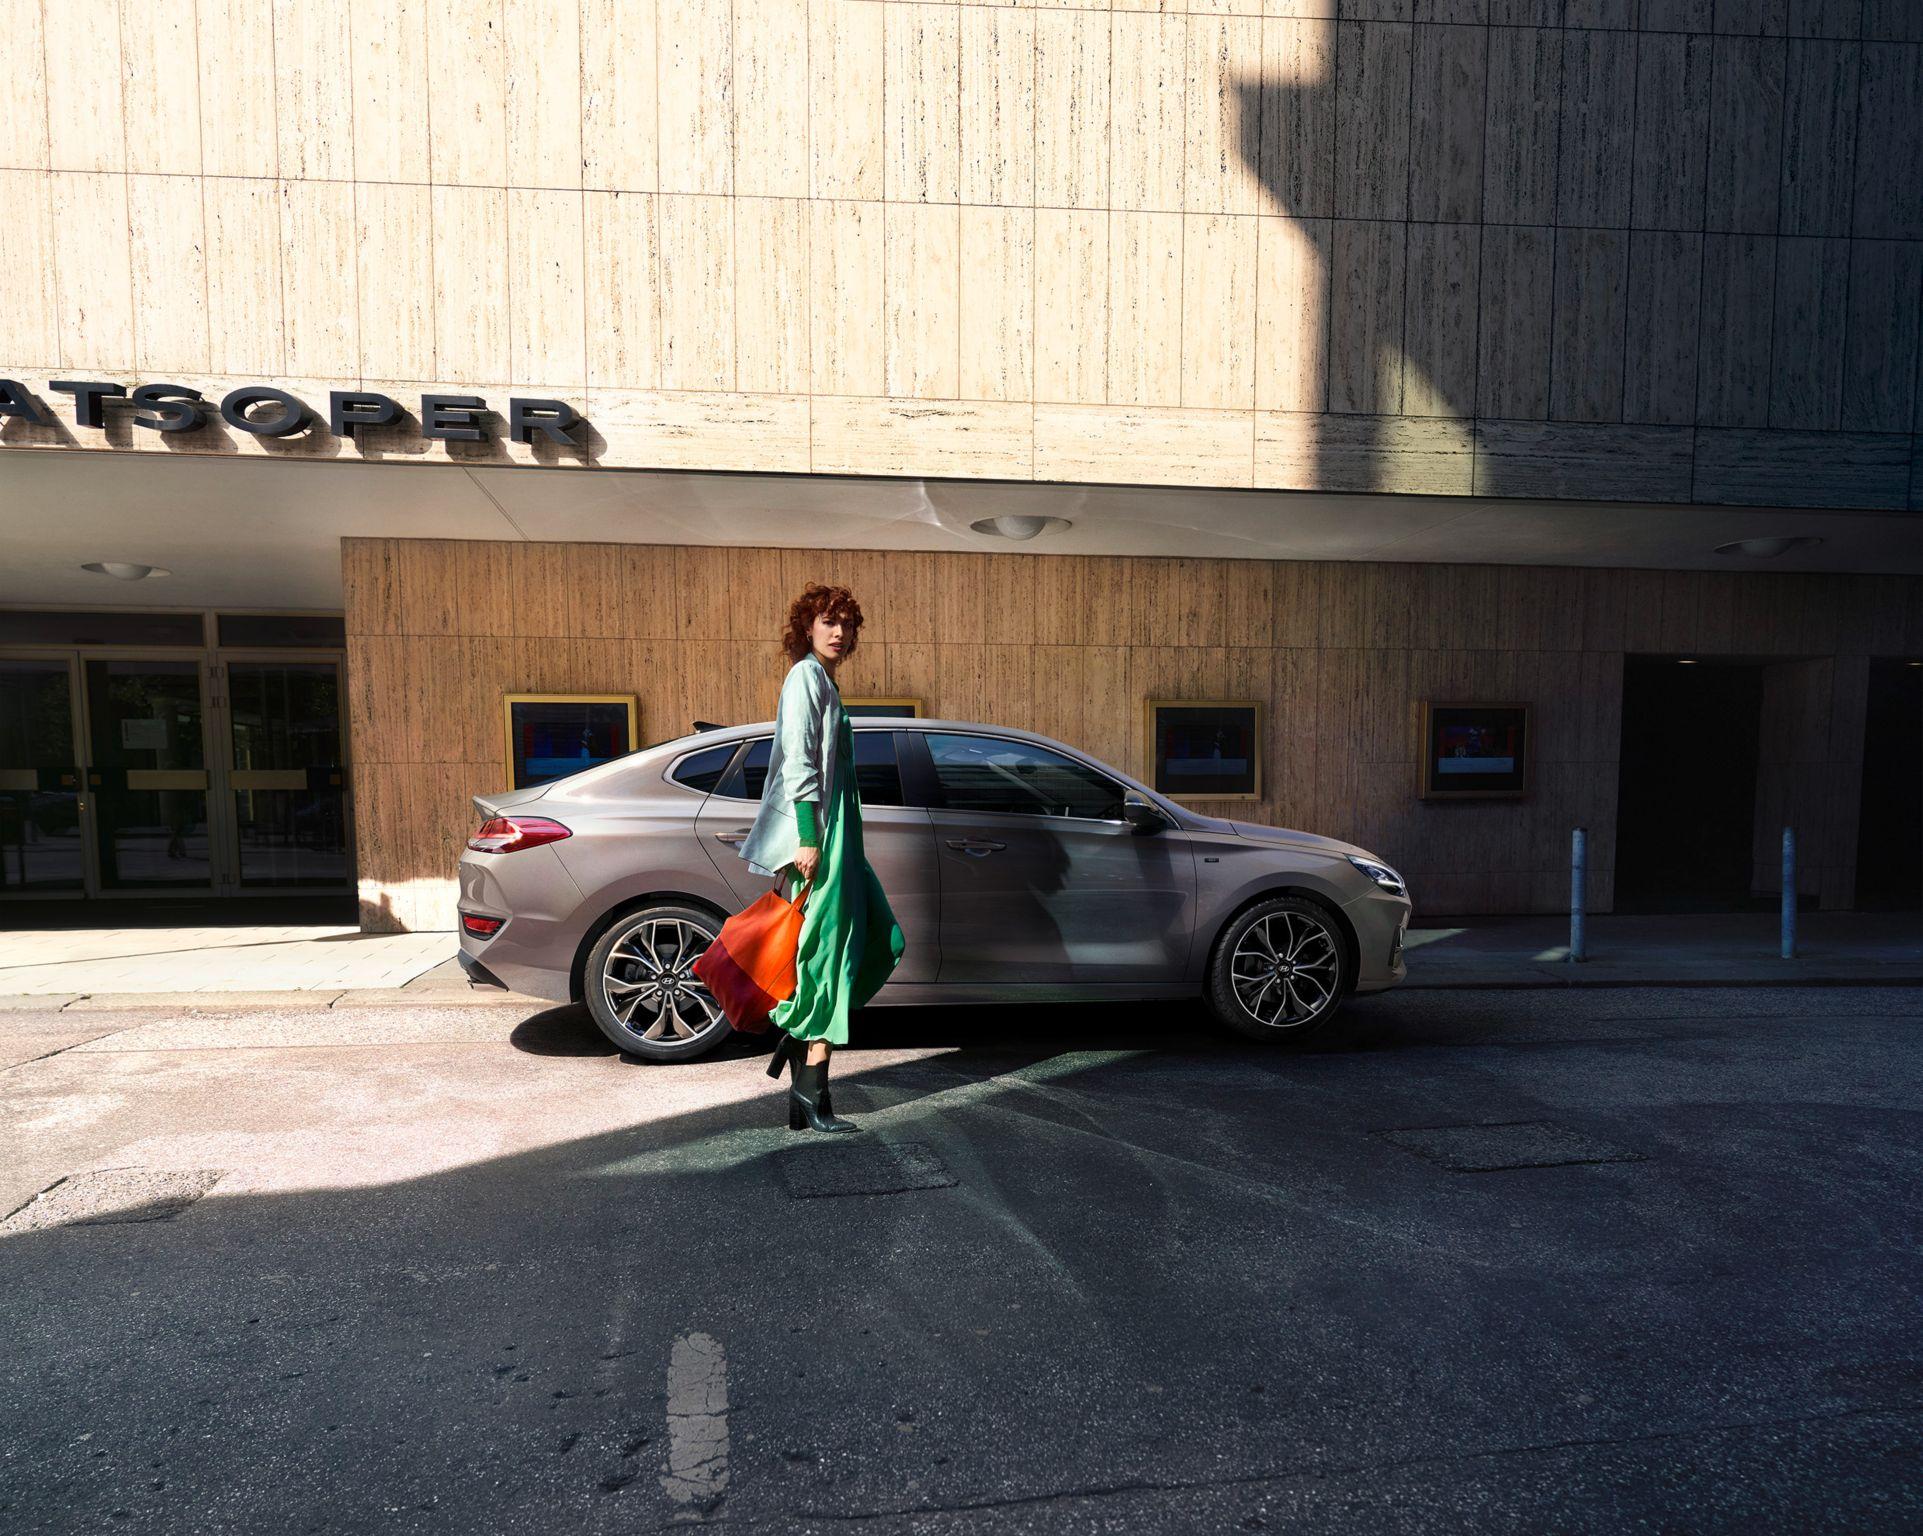 Hyundai i30 Fastback 1.5 T-GDI iMT 48V N-Line (Benzina Hybrid) - Dimensioni, Consumi e Dotazioni di serie